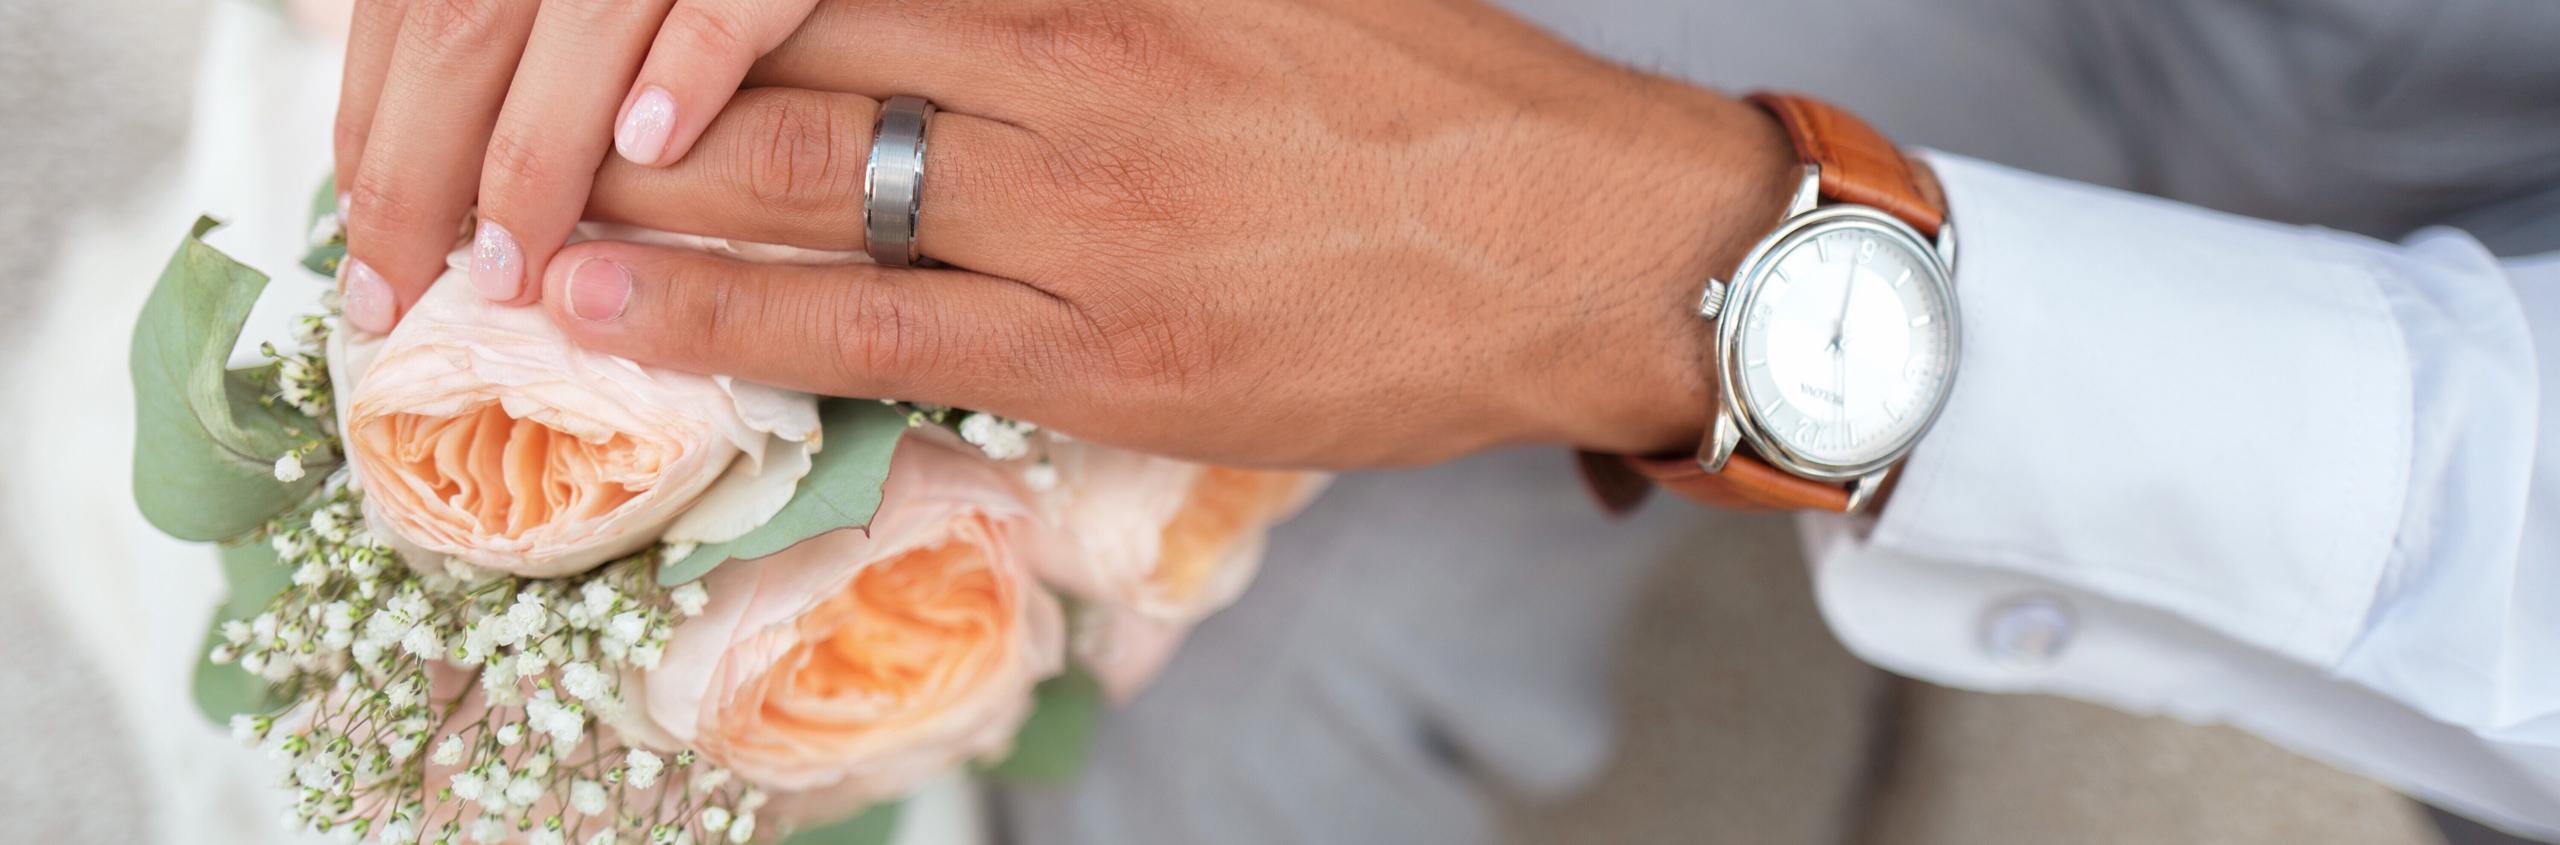 svadba-akcie-3.jpg